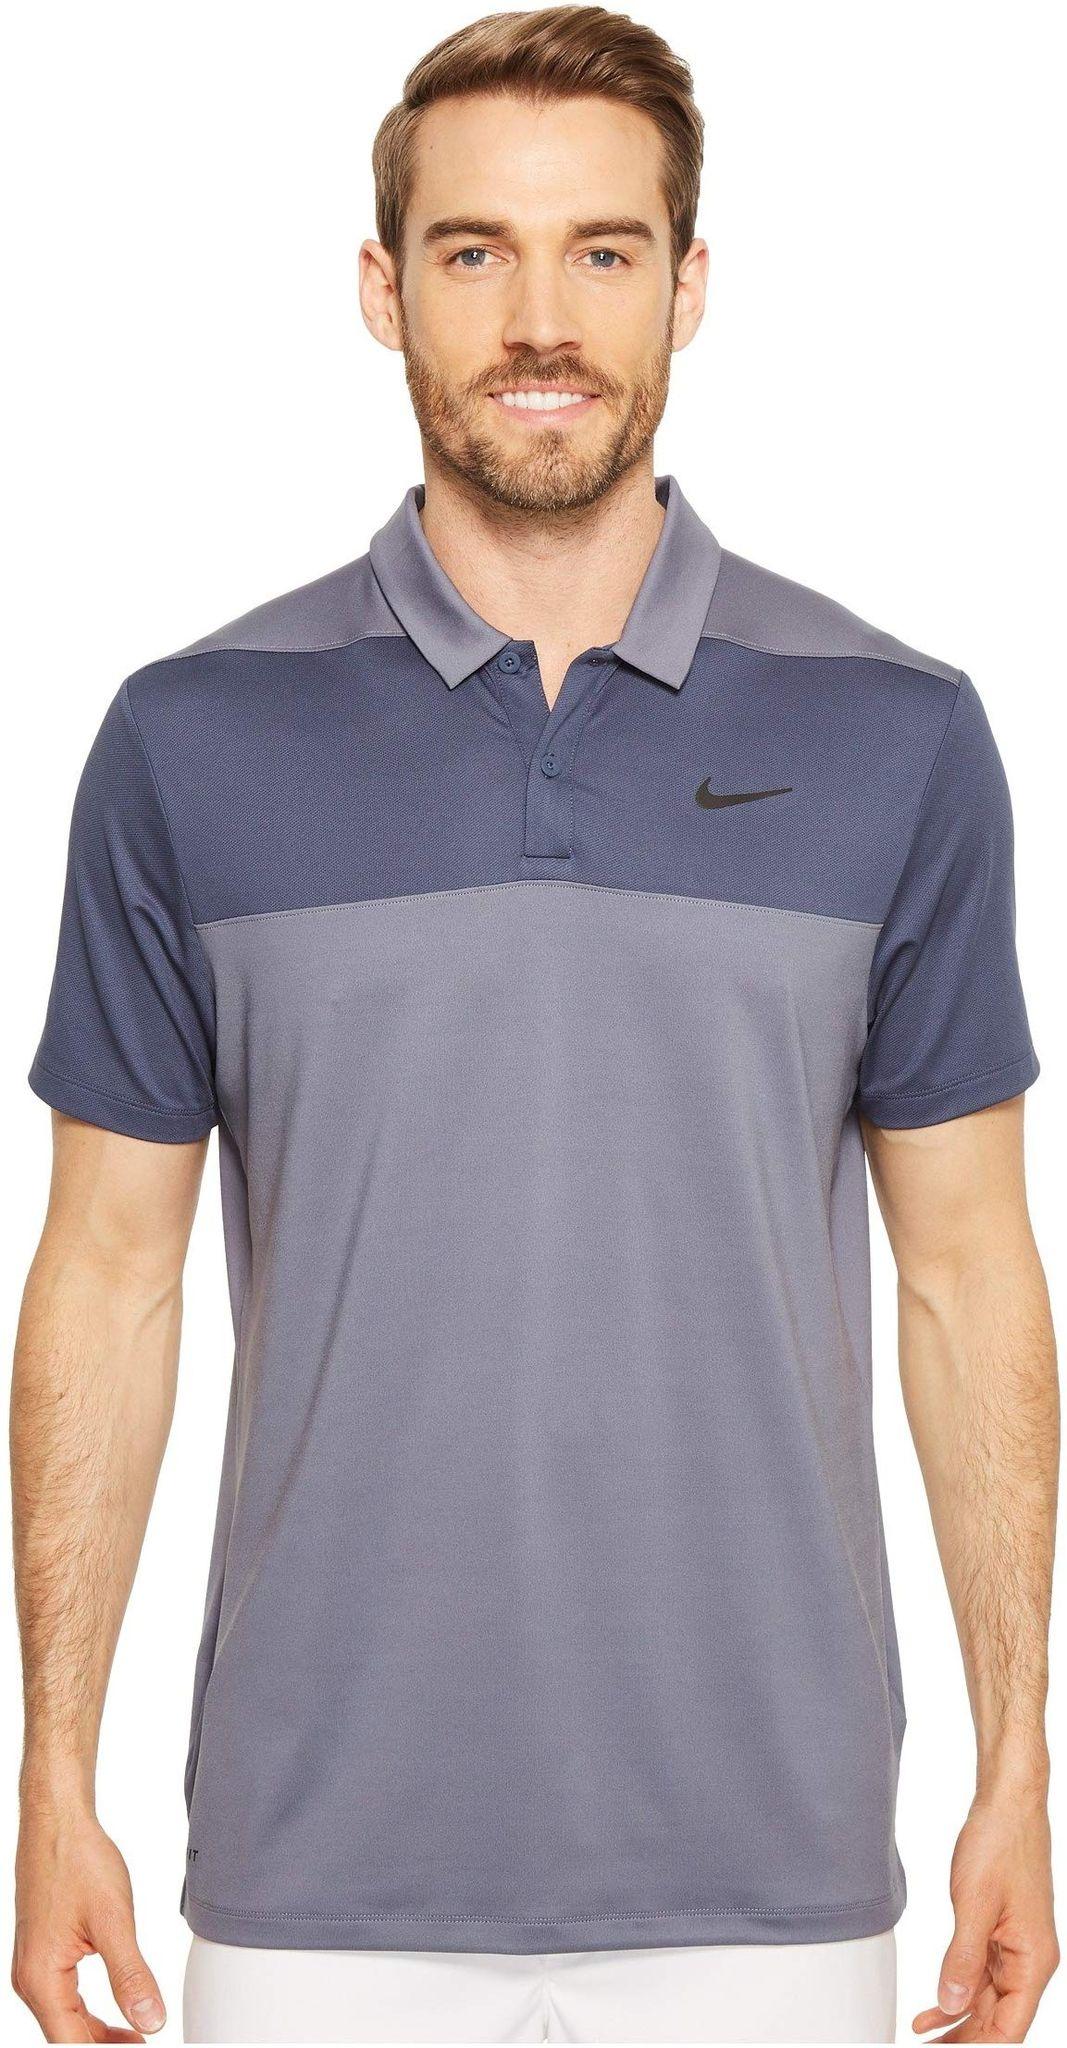 0018924b9 سعر Walmart Lacoste Men's Blue Heather Polo Shirt فى مصر | جوميا ...